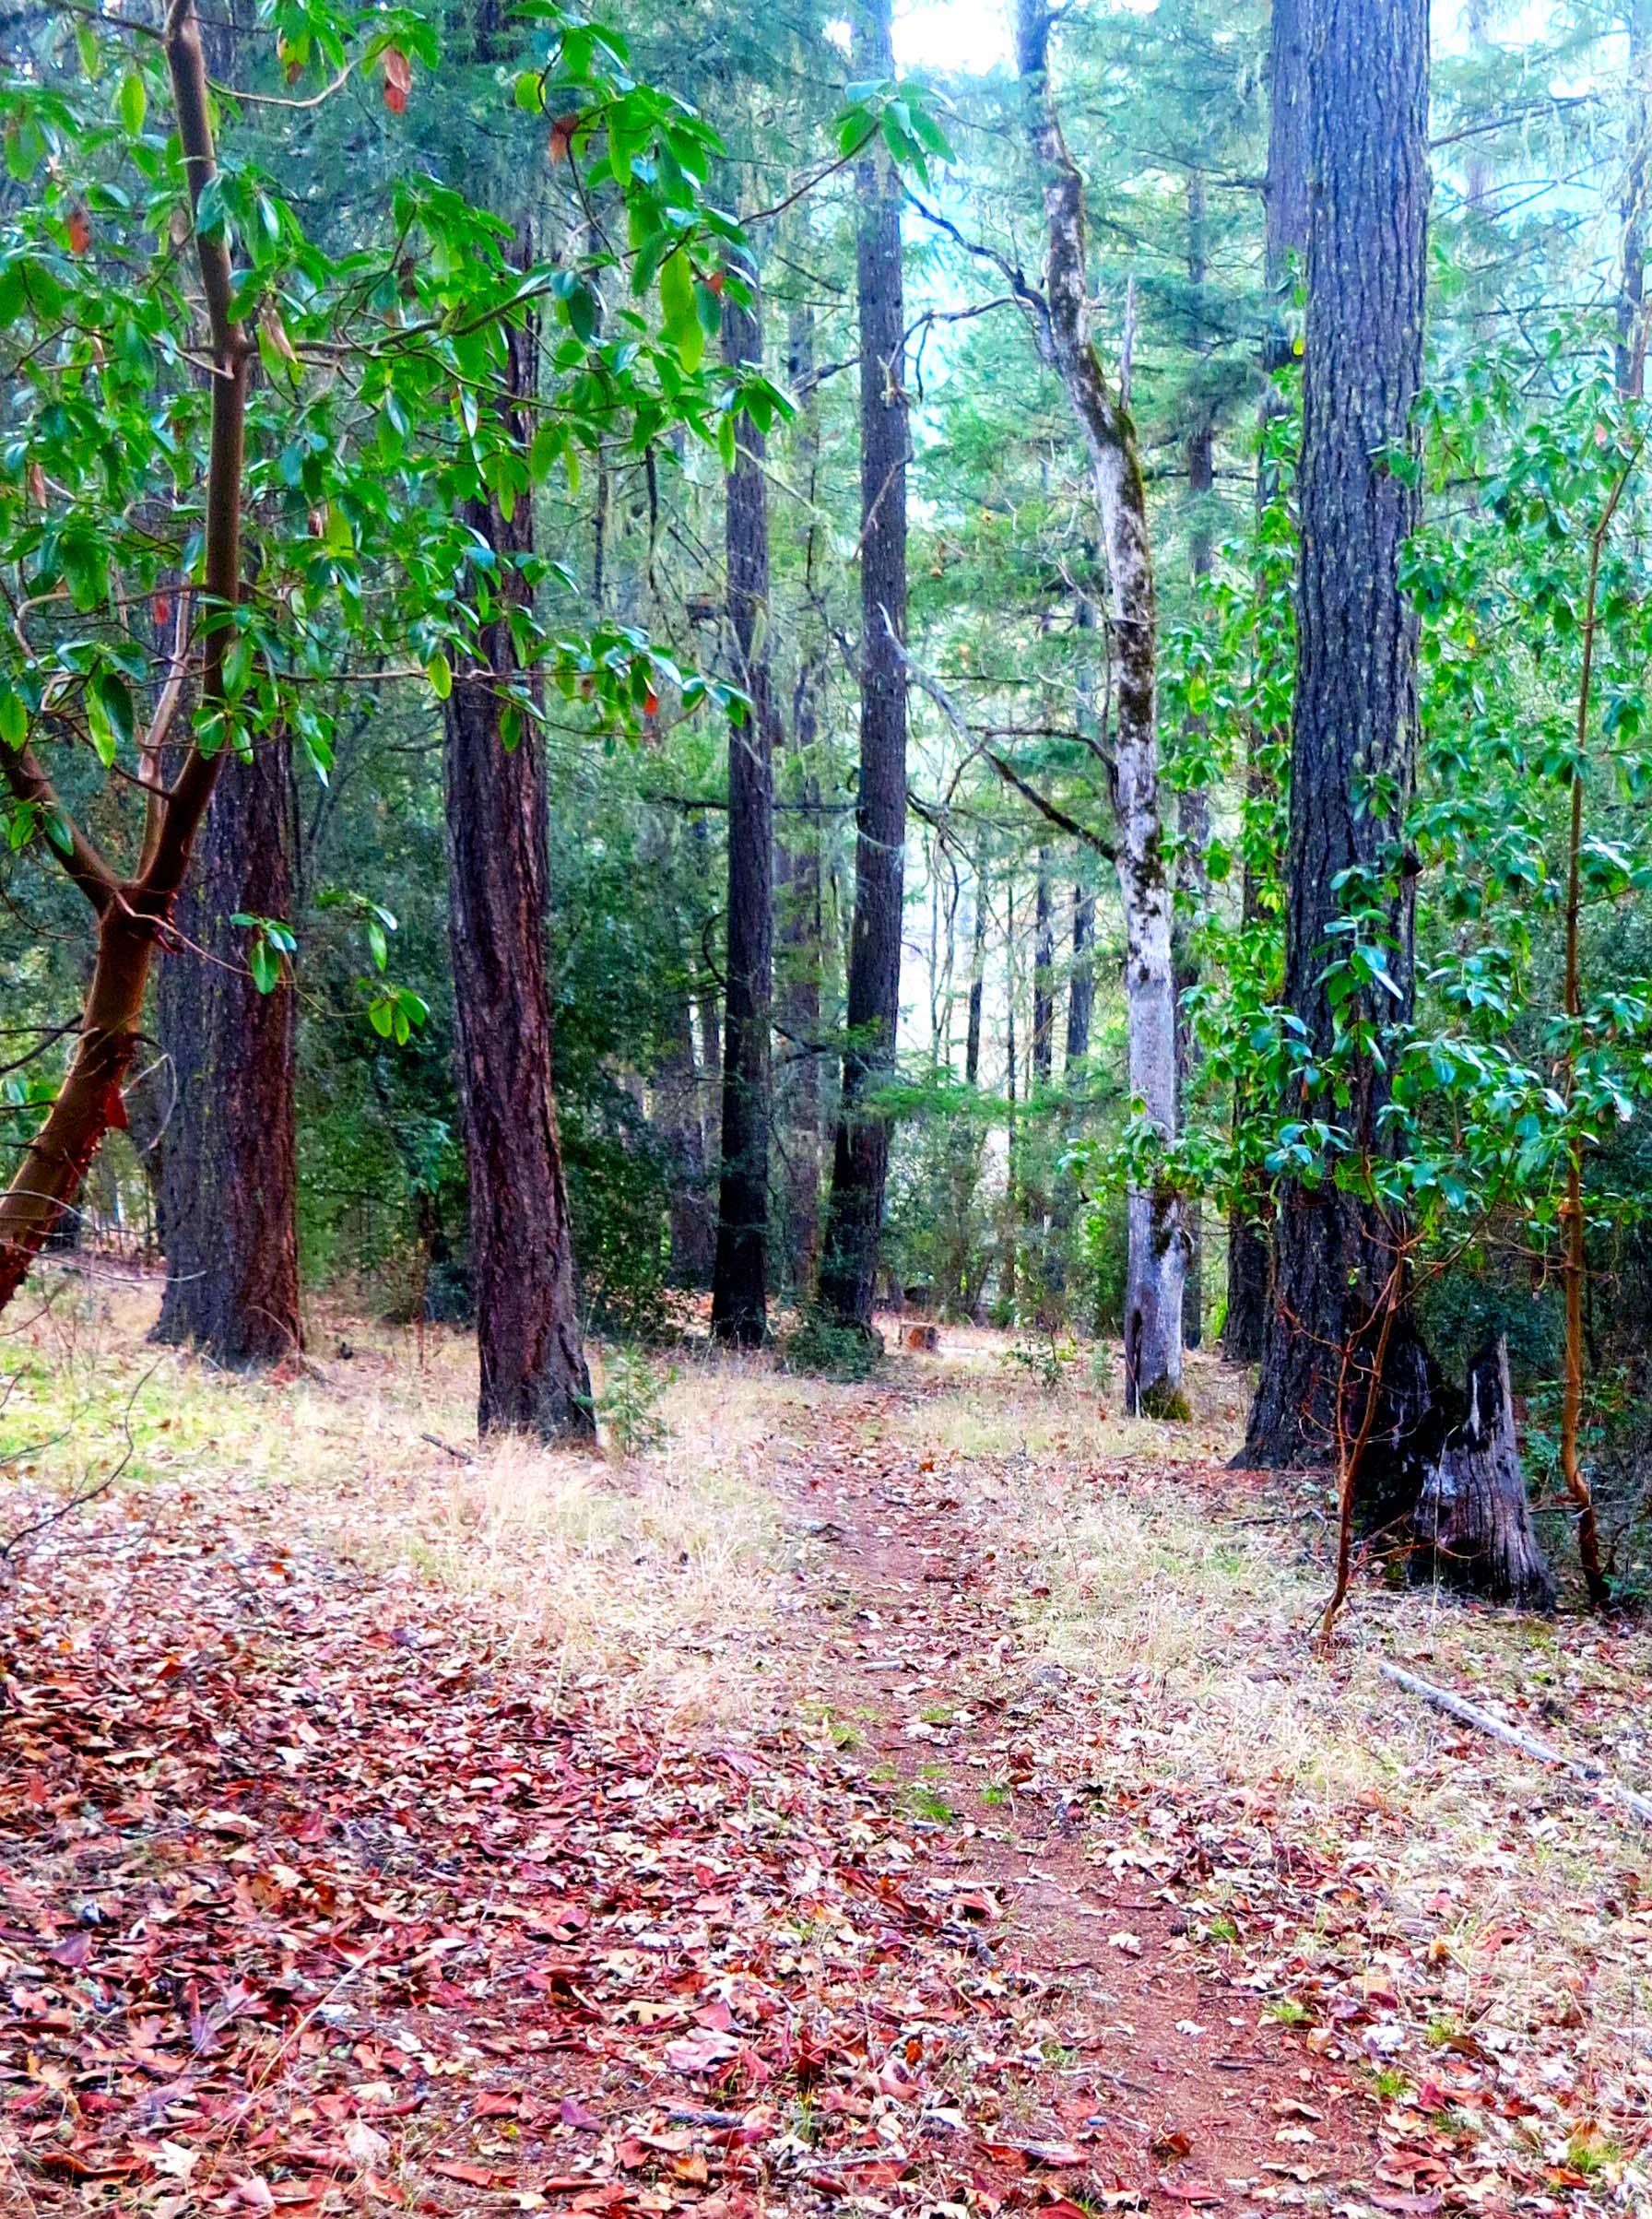 Applegate Valley trail through ponderosa Pines and Douglas Fir. Photo by Curtis Mekemson.